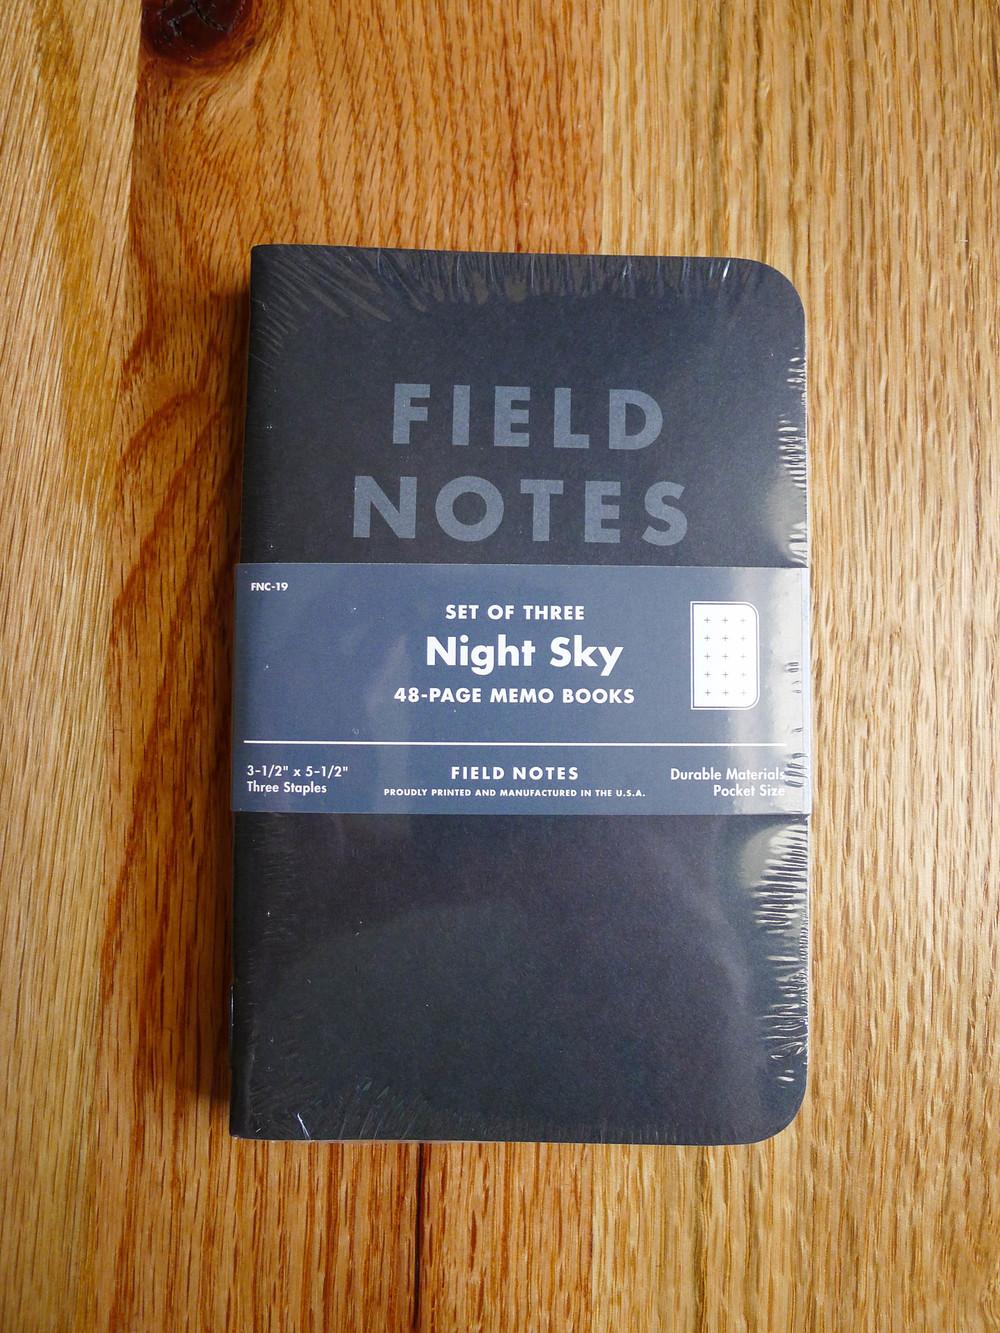 Night Sky Edition - Summer 2013